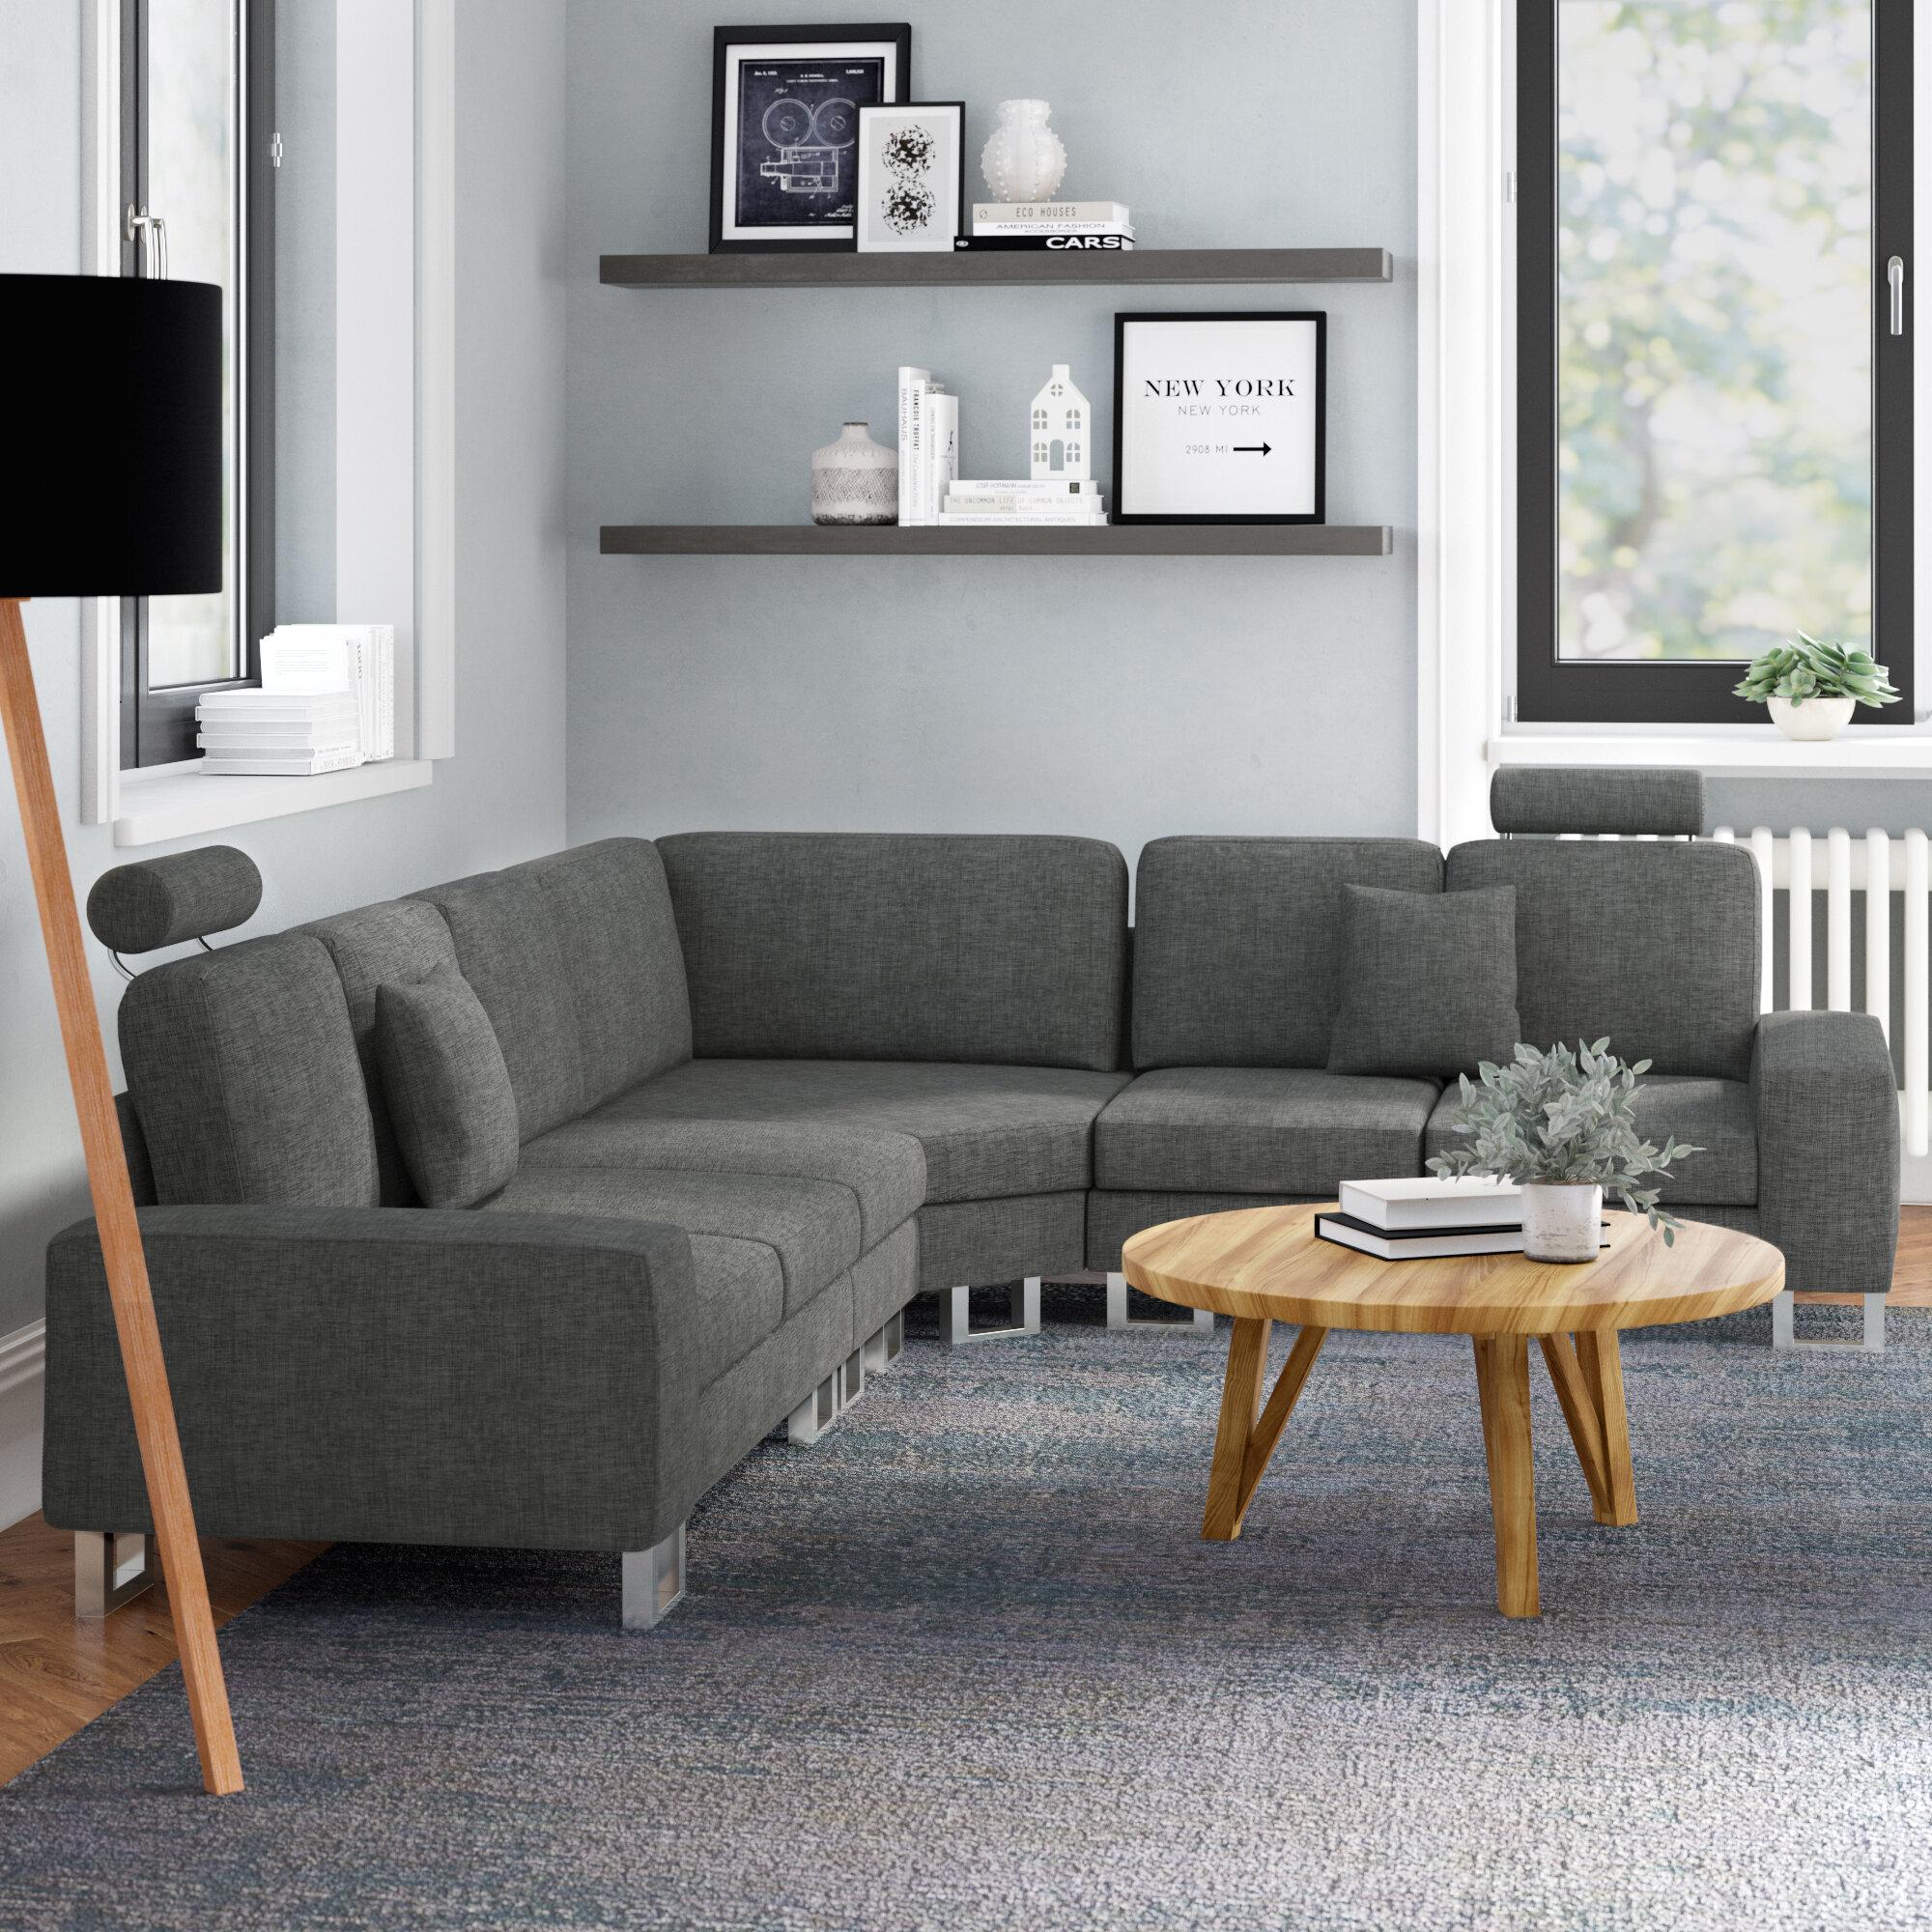 Home & Haus Stockholm Modular Corner Sofa & Reviews   Wayfair.co.uk